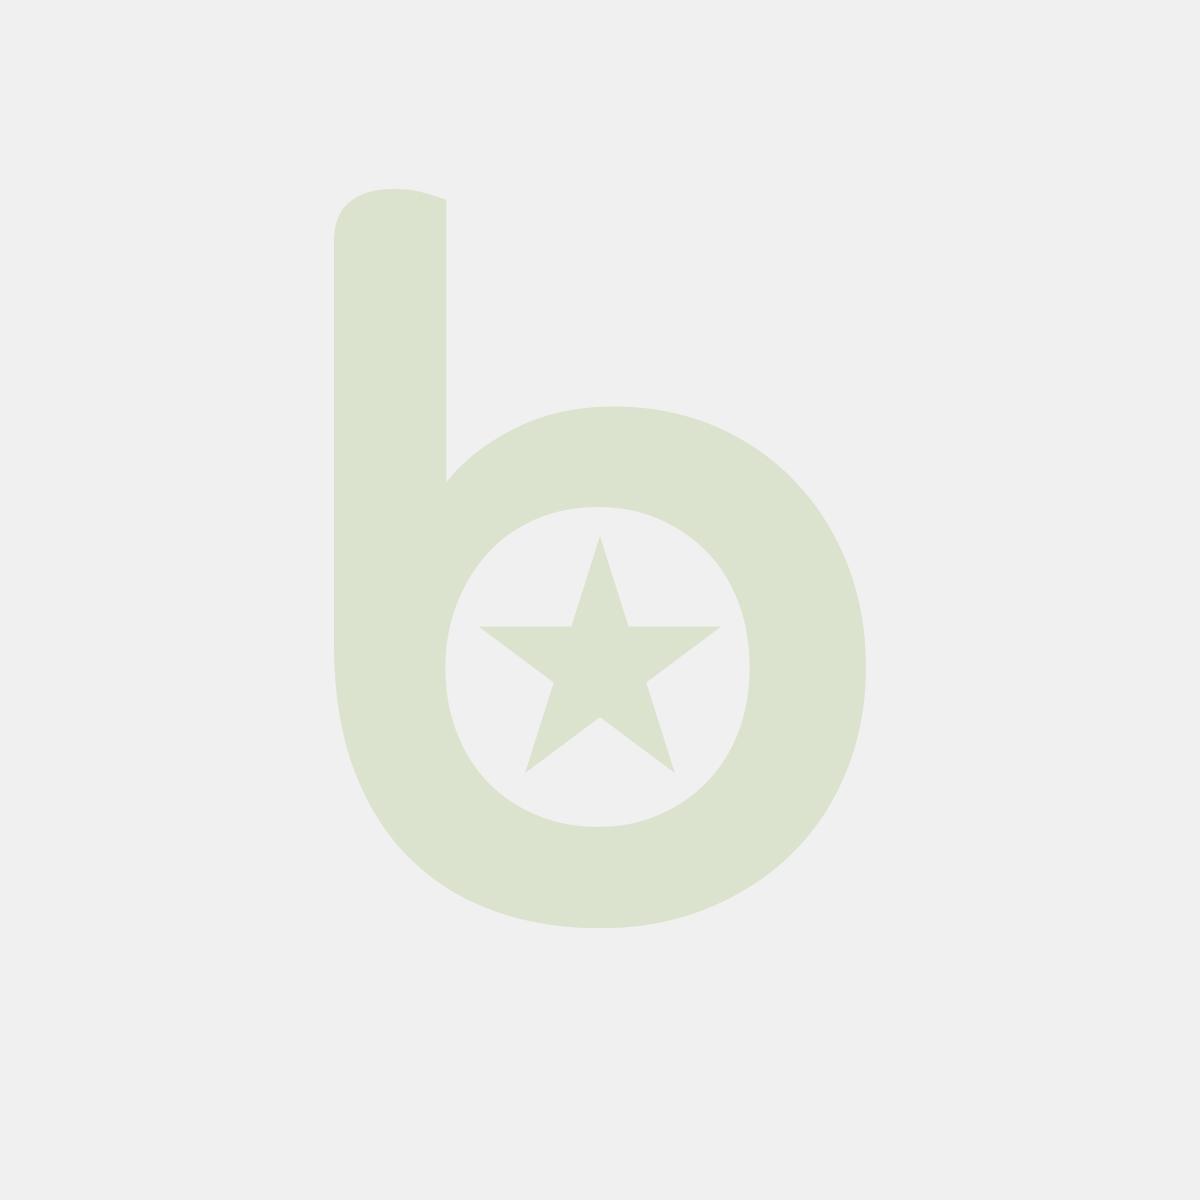 COVB 350 przykrywka do BOL400 op.100szt (6)